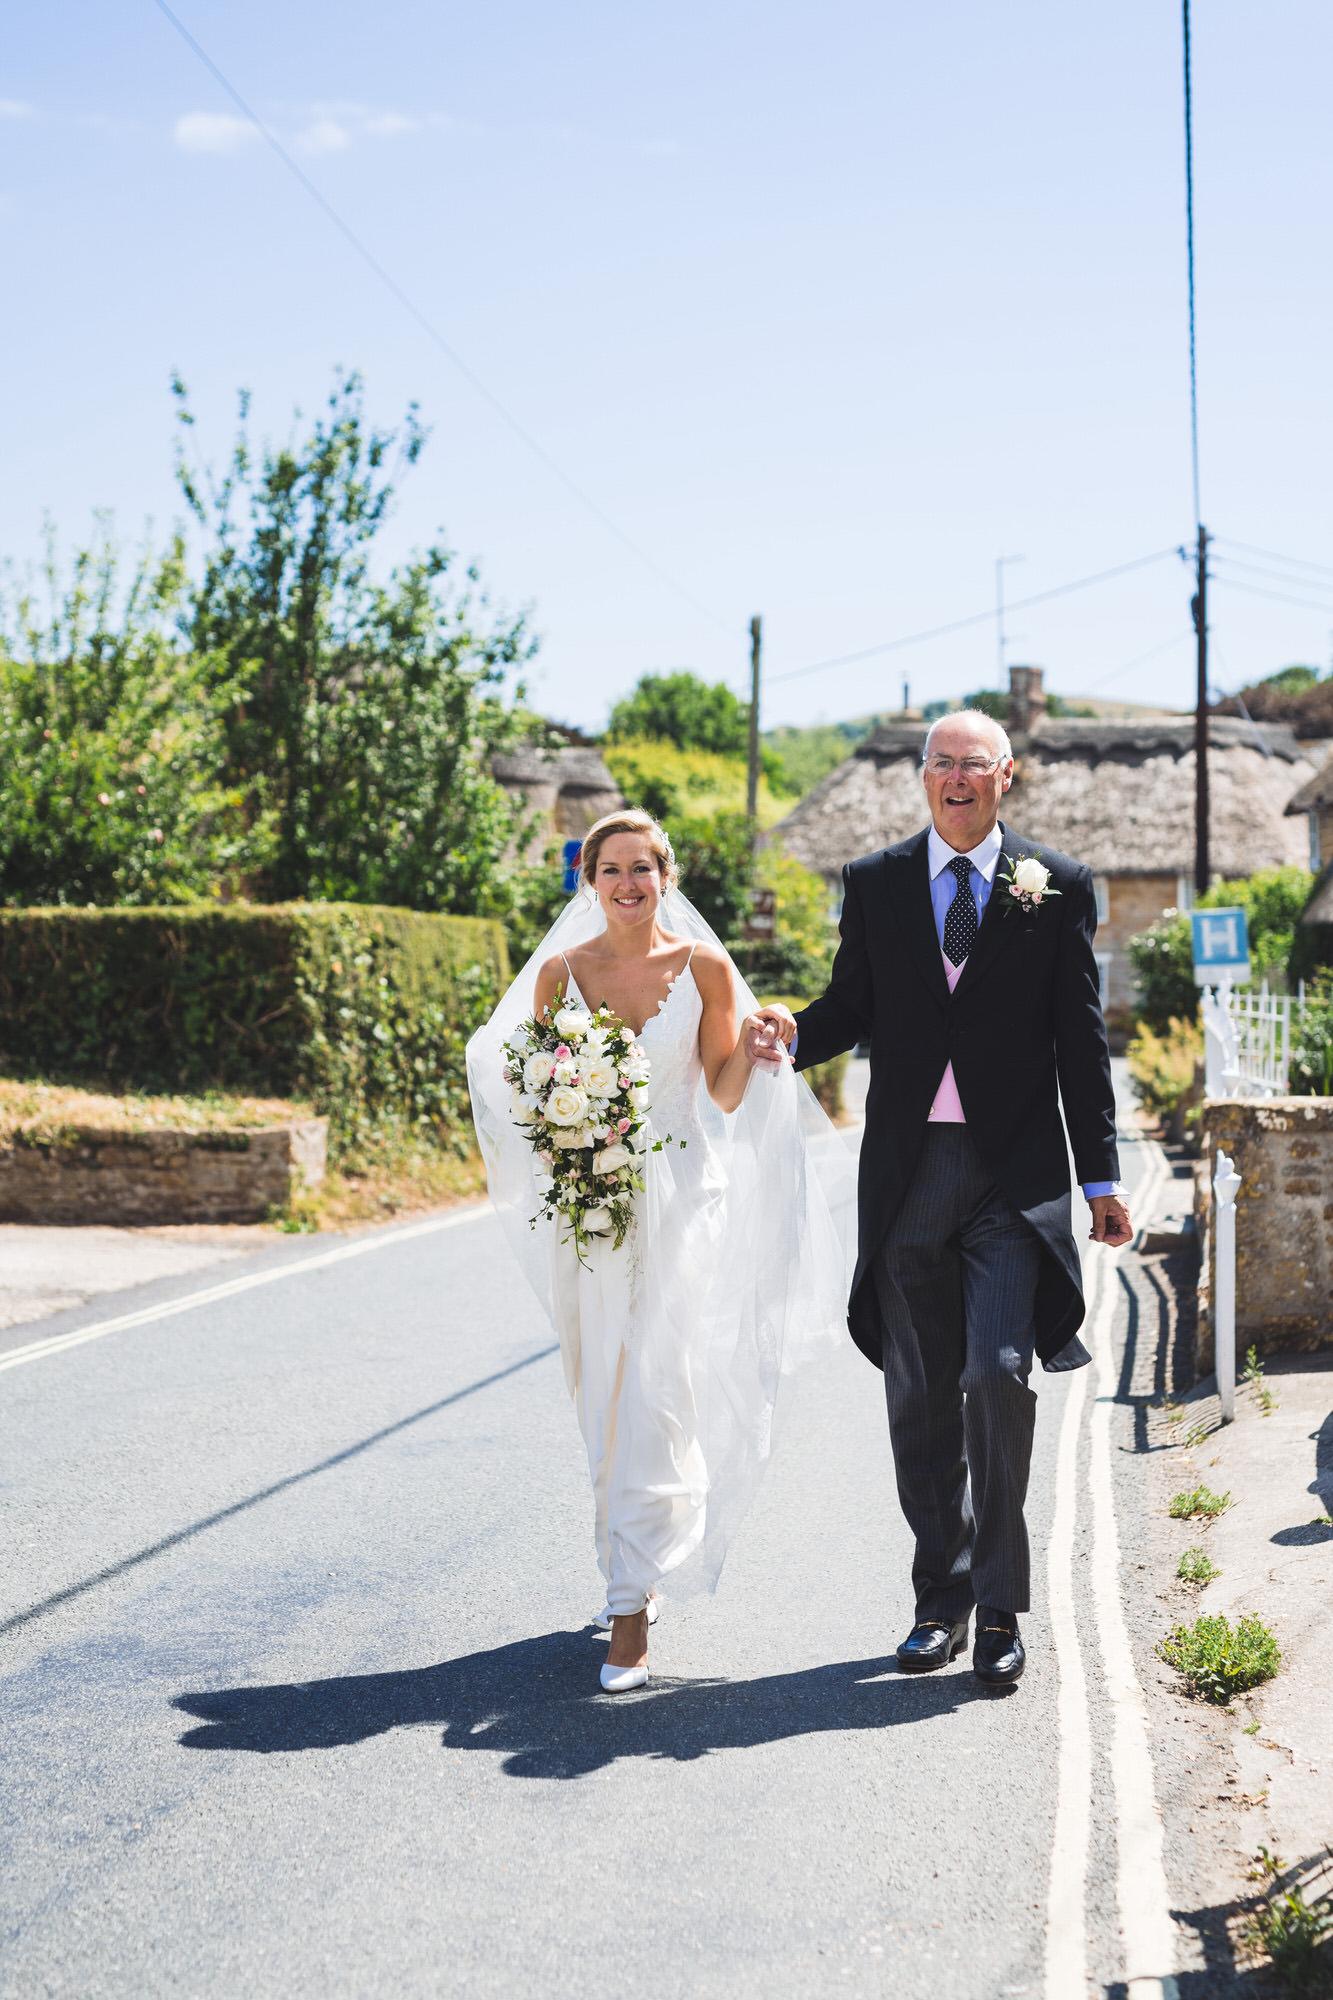 Dorset marquee wedding by the sea simon biffen photography 12